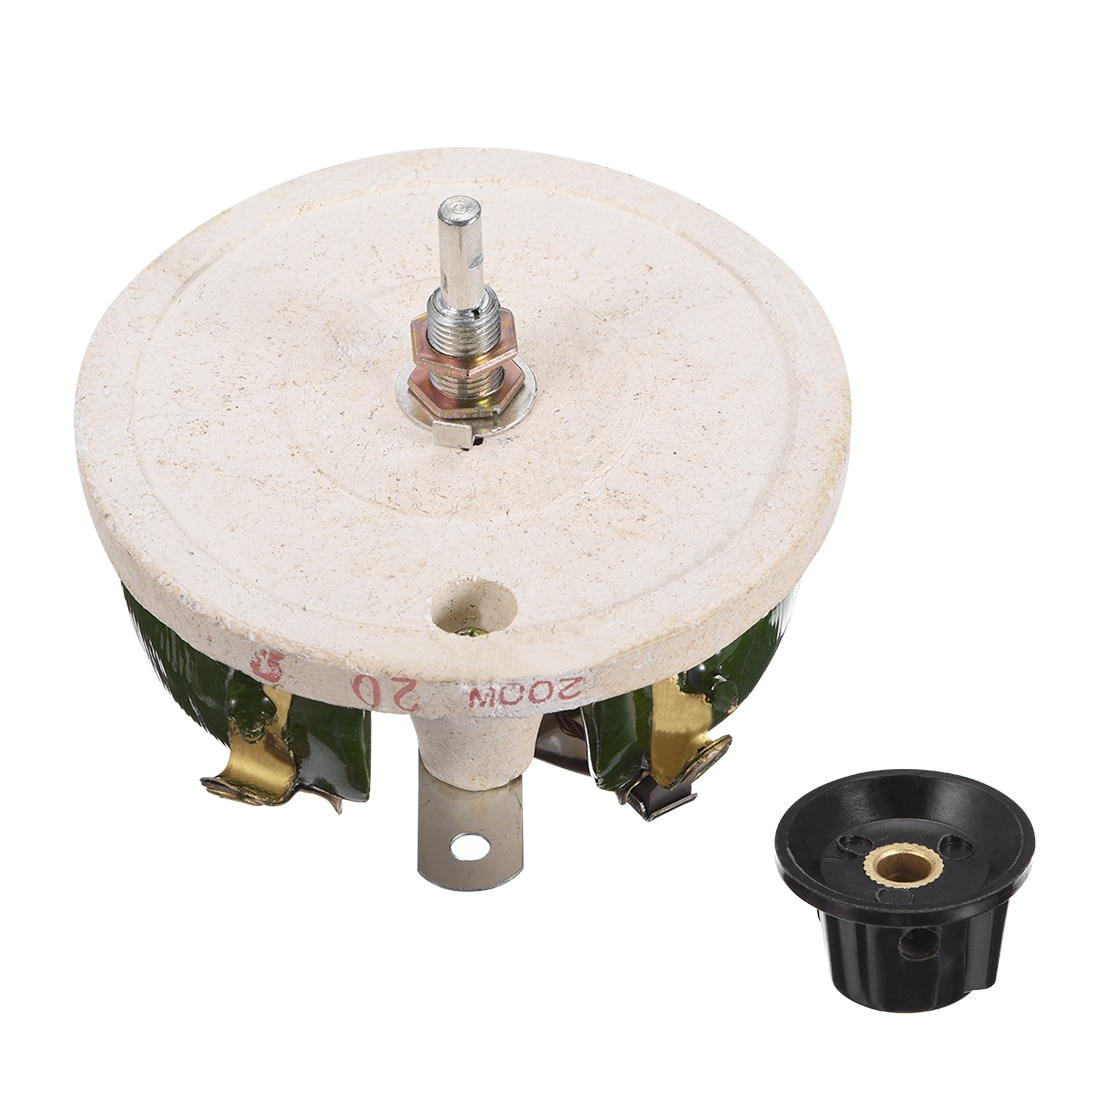 Uxcell-مقياس جهد سيراميك متغير ، 200 واط ، 20R أوم ، مقاوم مقاوم مقاوم مقاوم مع مقبض